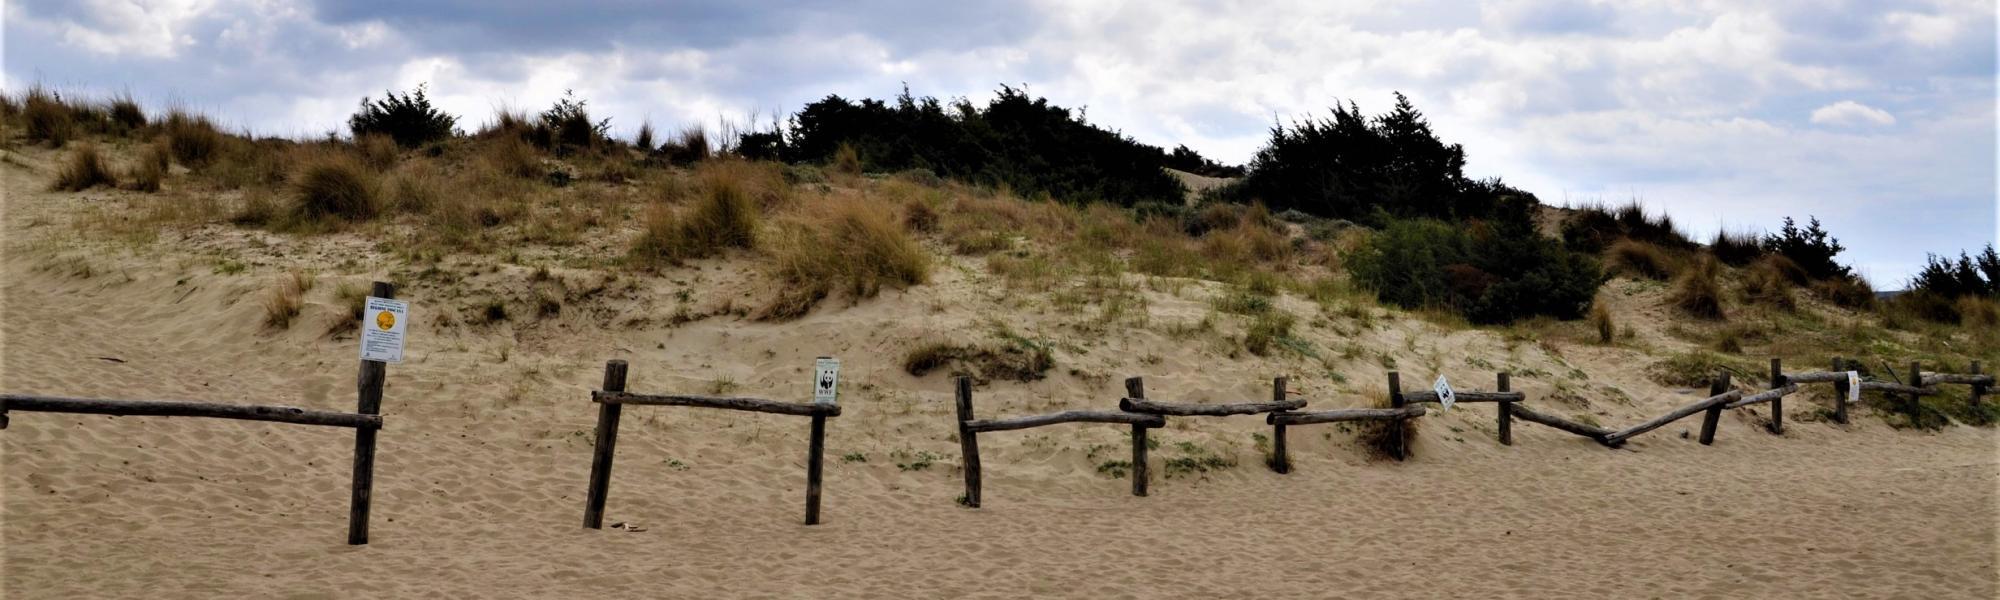 Oasi WWF Dune di Tirrenia (L. Corevi, Comune di Pisa)